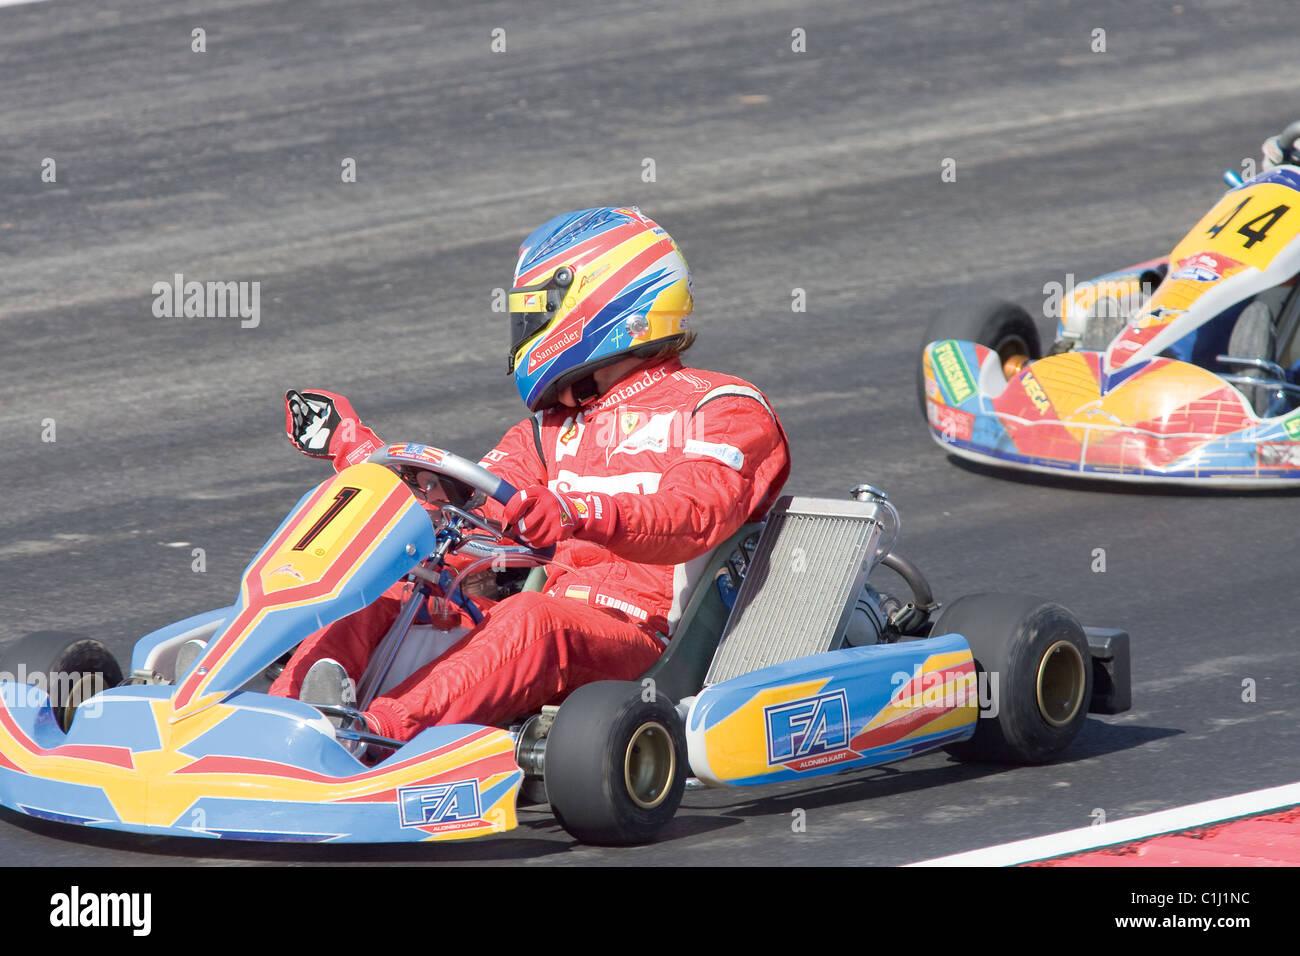 Circuito Fernando Alonso Posada : Karting on board circuito fernando alonso  youtube